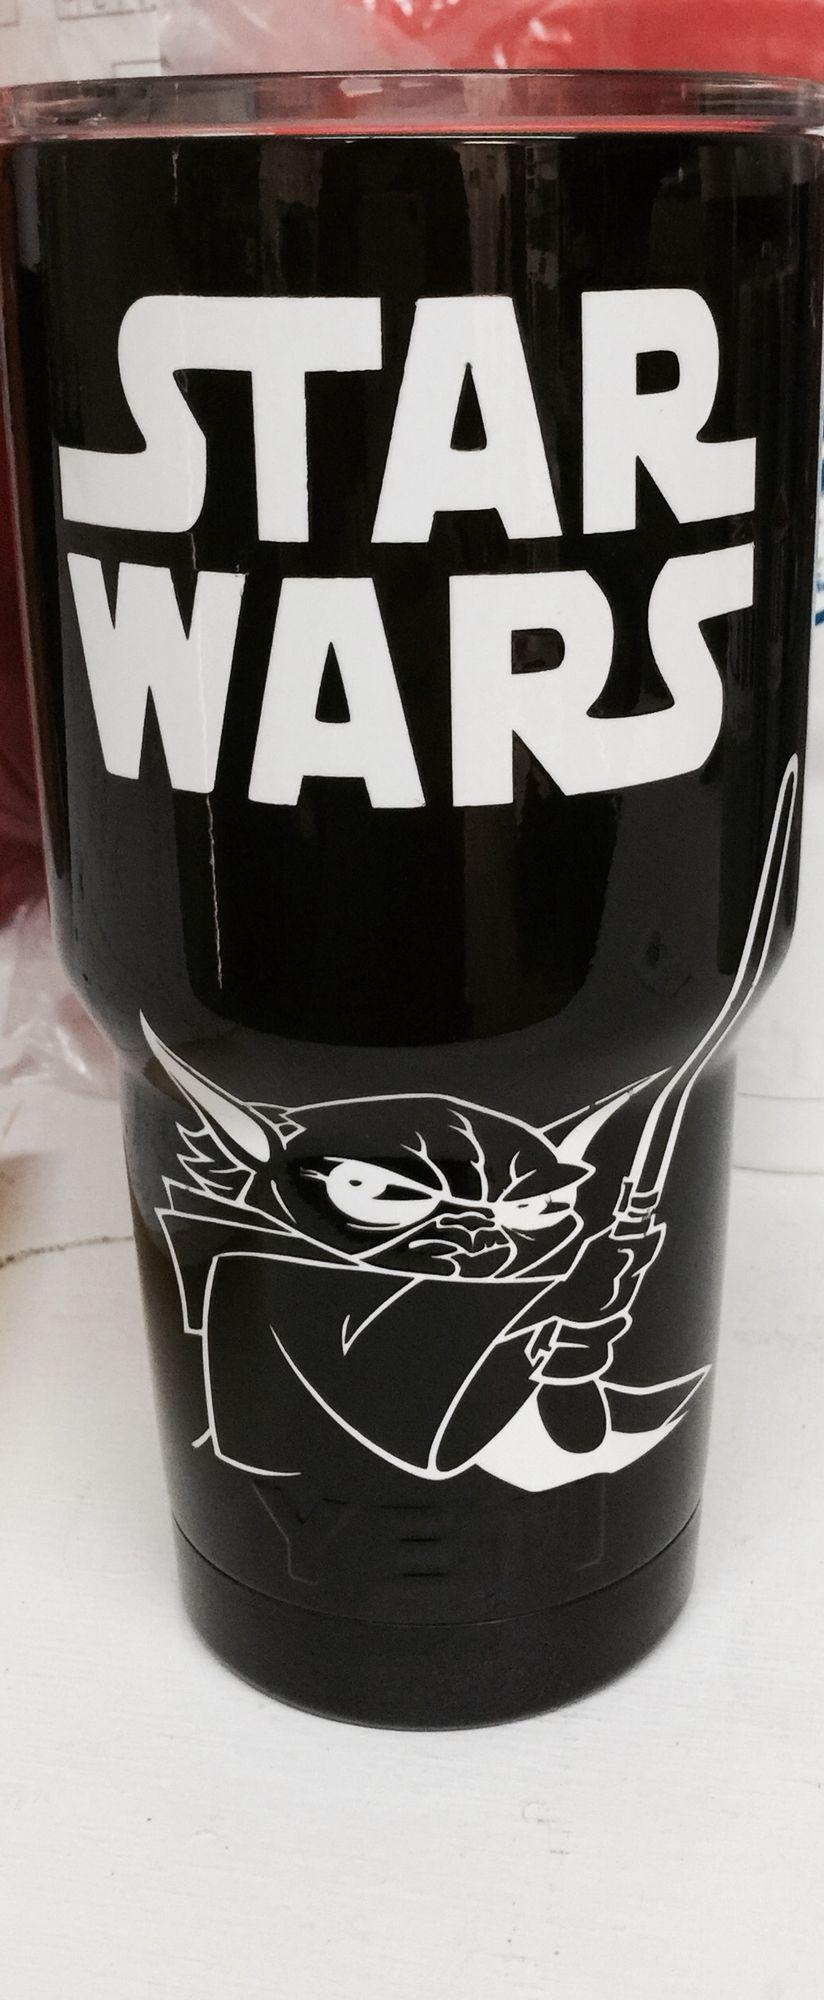 Star Wars 30oz Yeti Cup Lonestar Concepts U0026 Design Lonestarjess15@yahoo.com